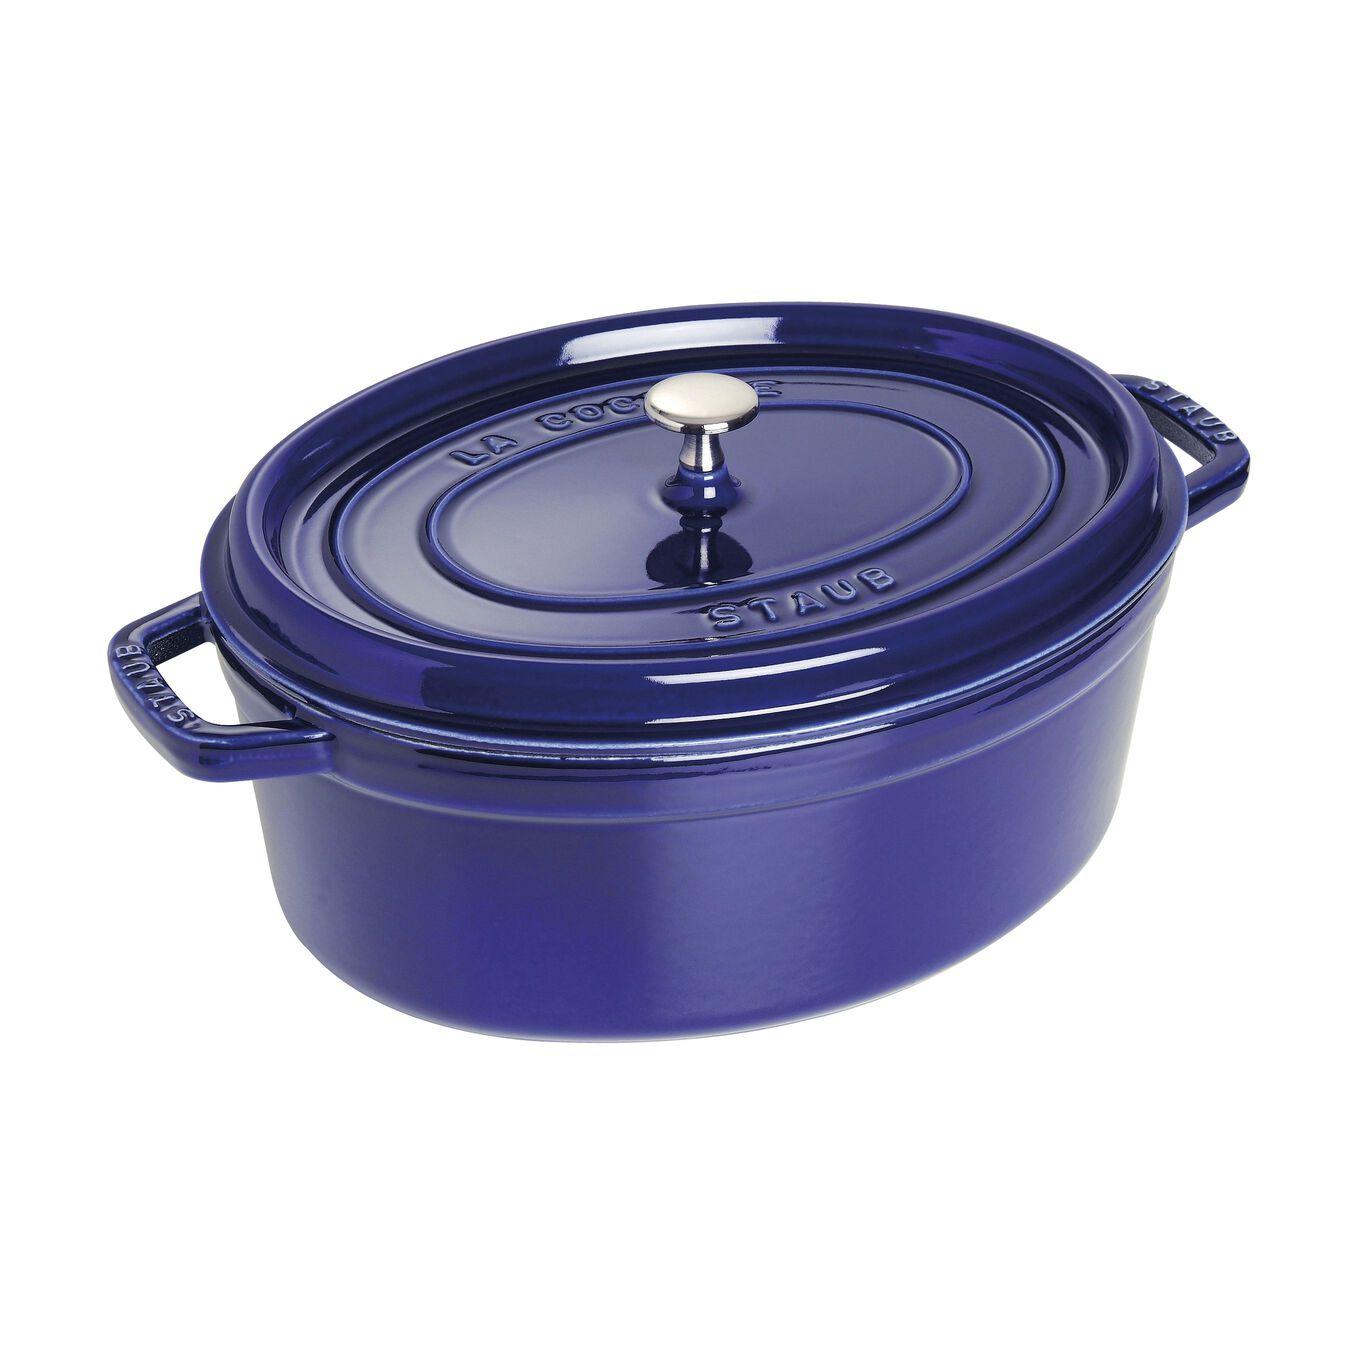 Caçarola 31 cm, oval, azul marinho, Ferro fundido,,large 1